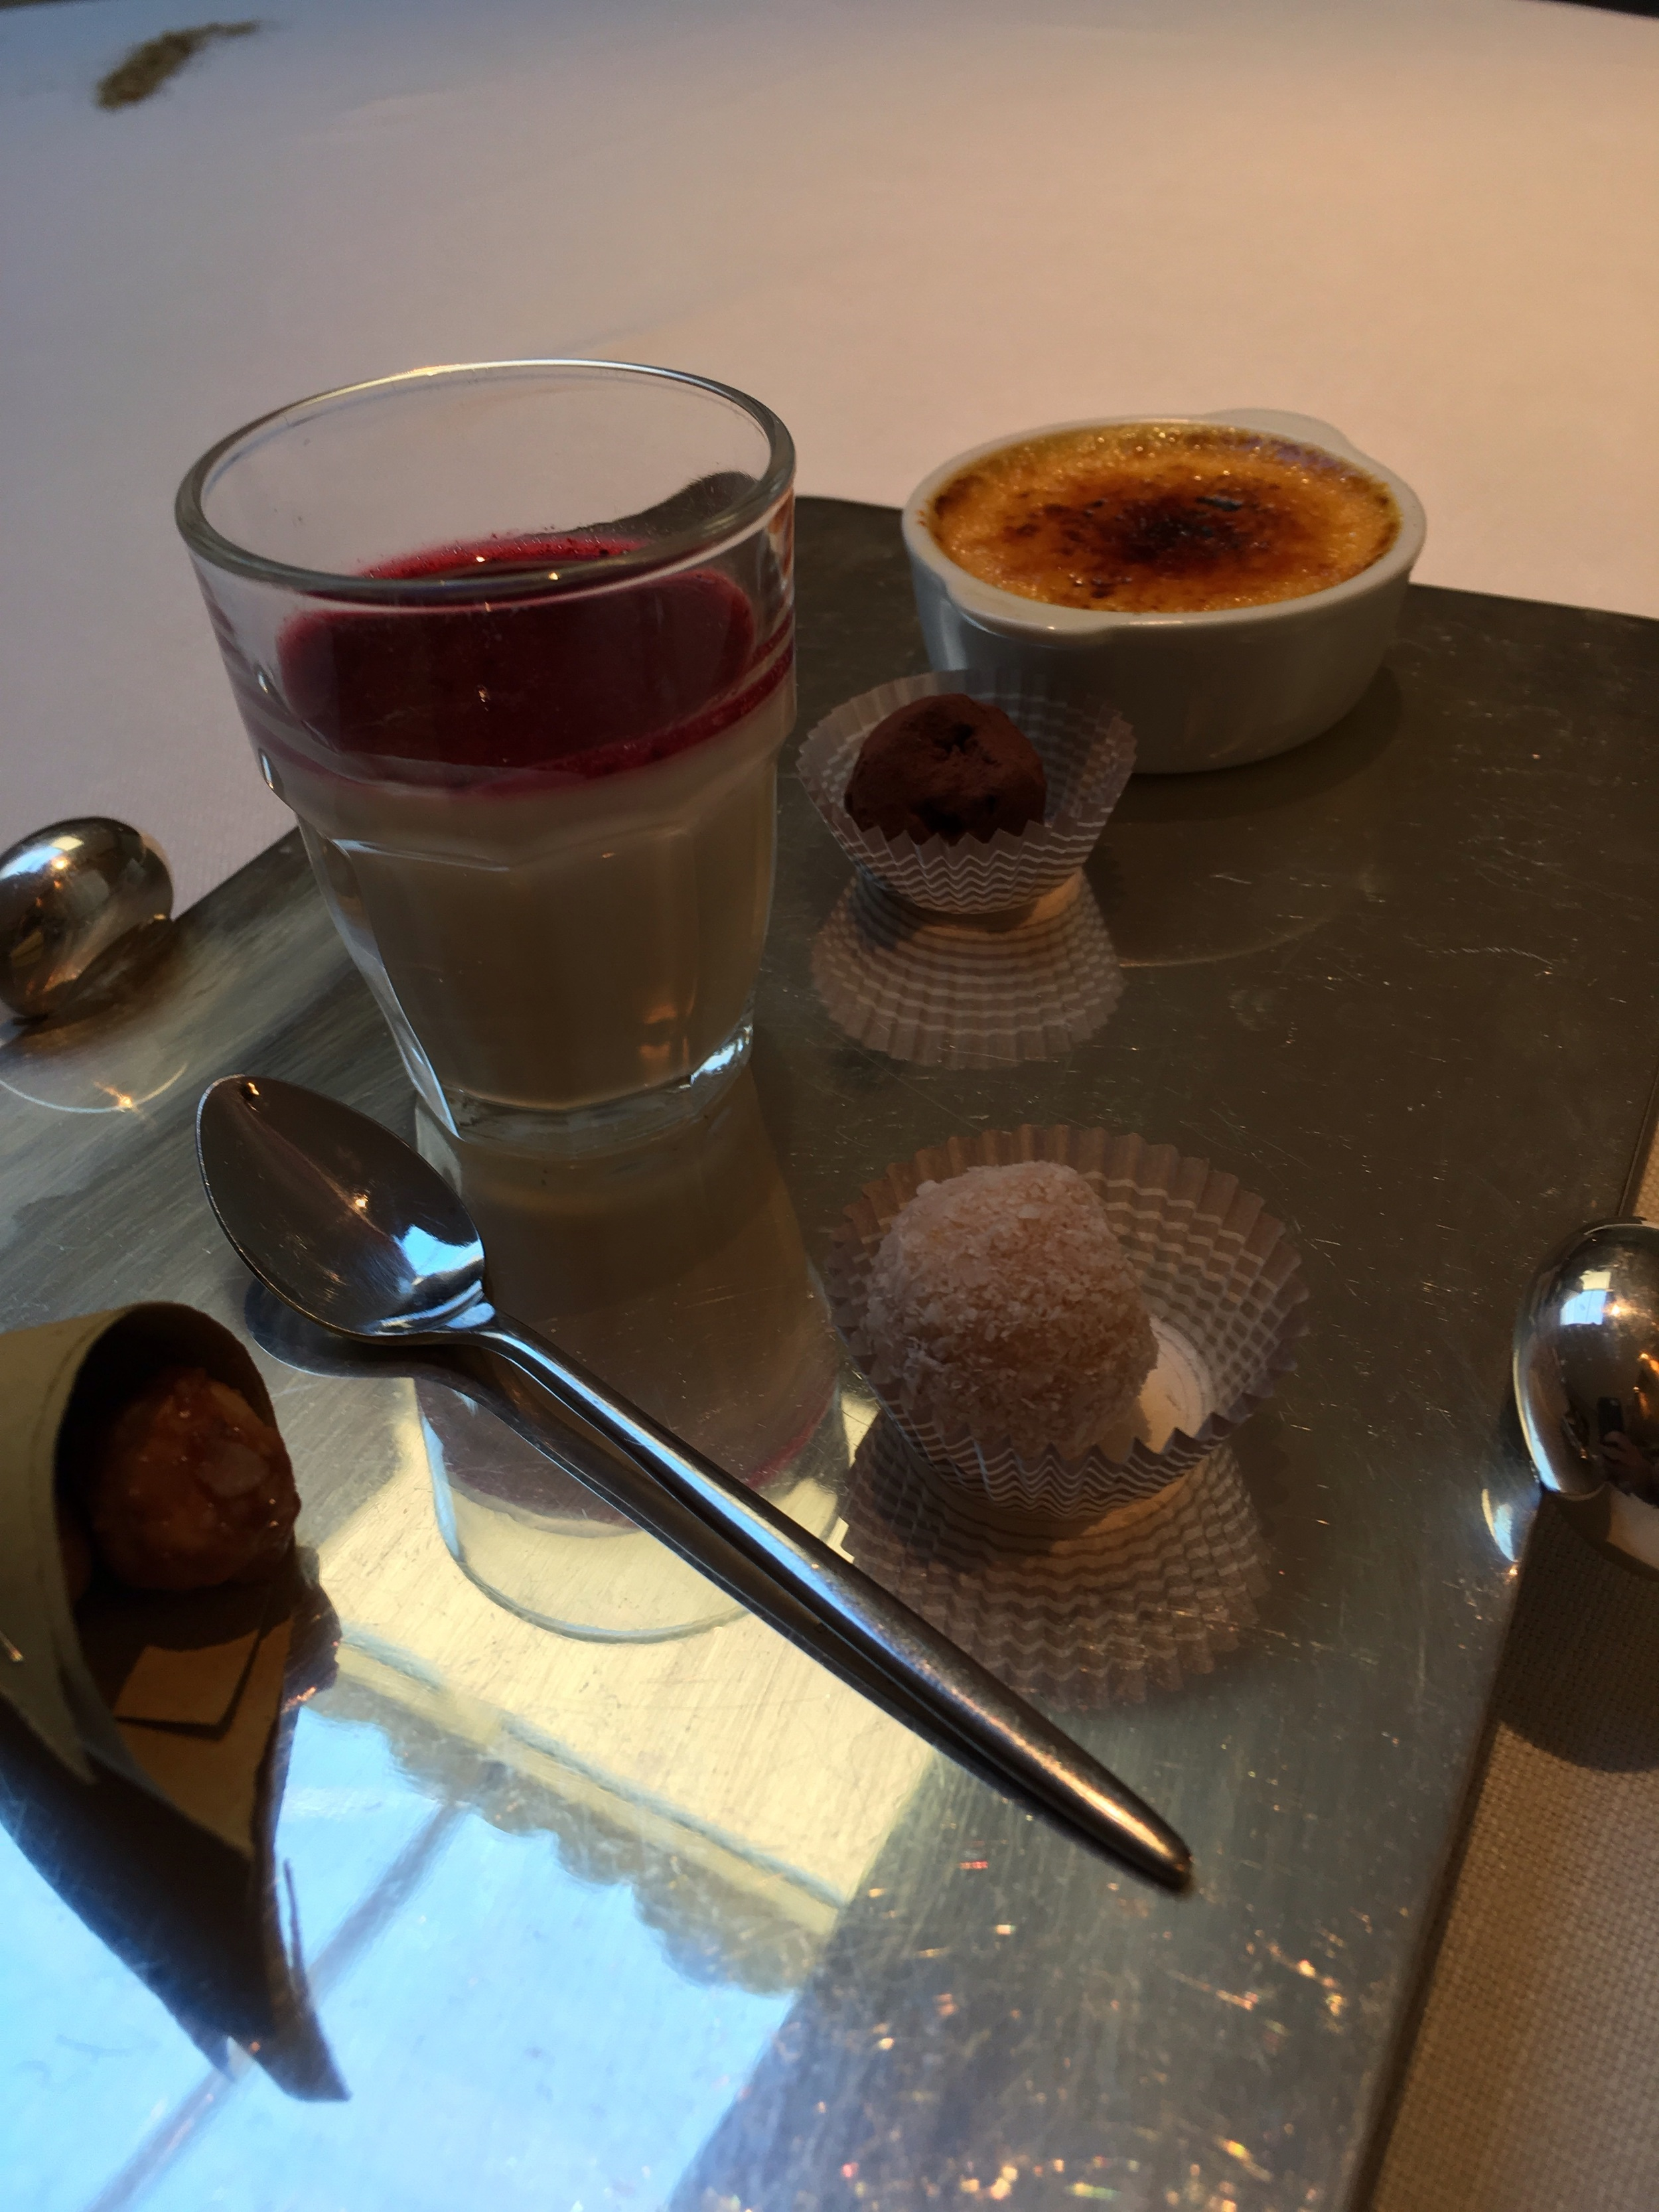 Dessert #3, Post Dessert, Dessert